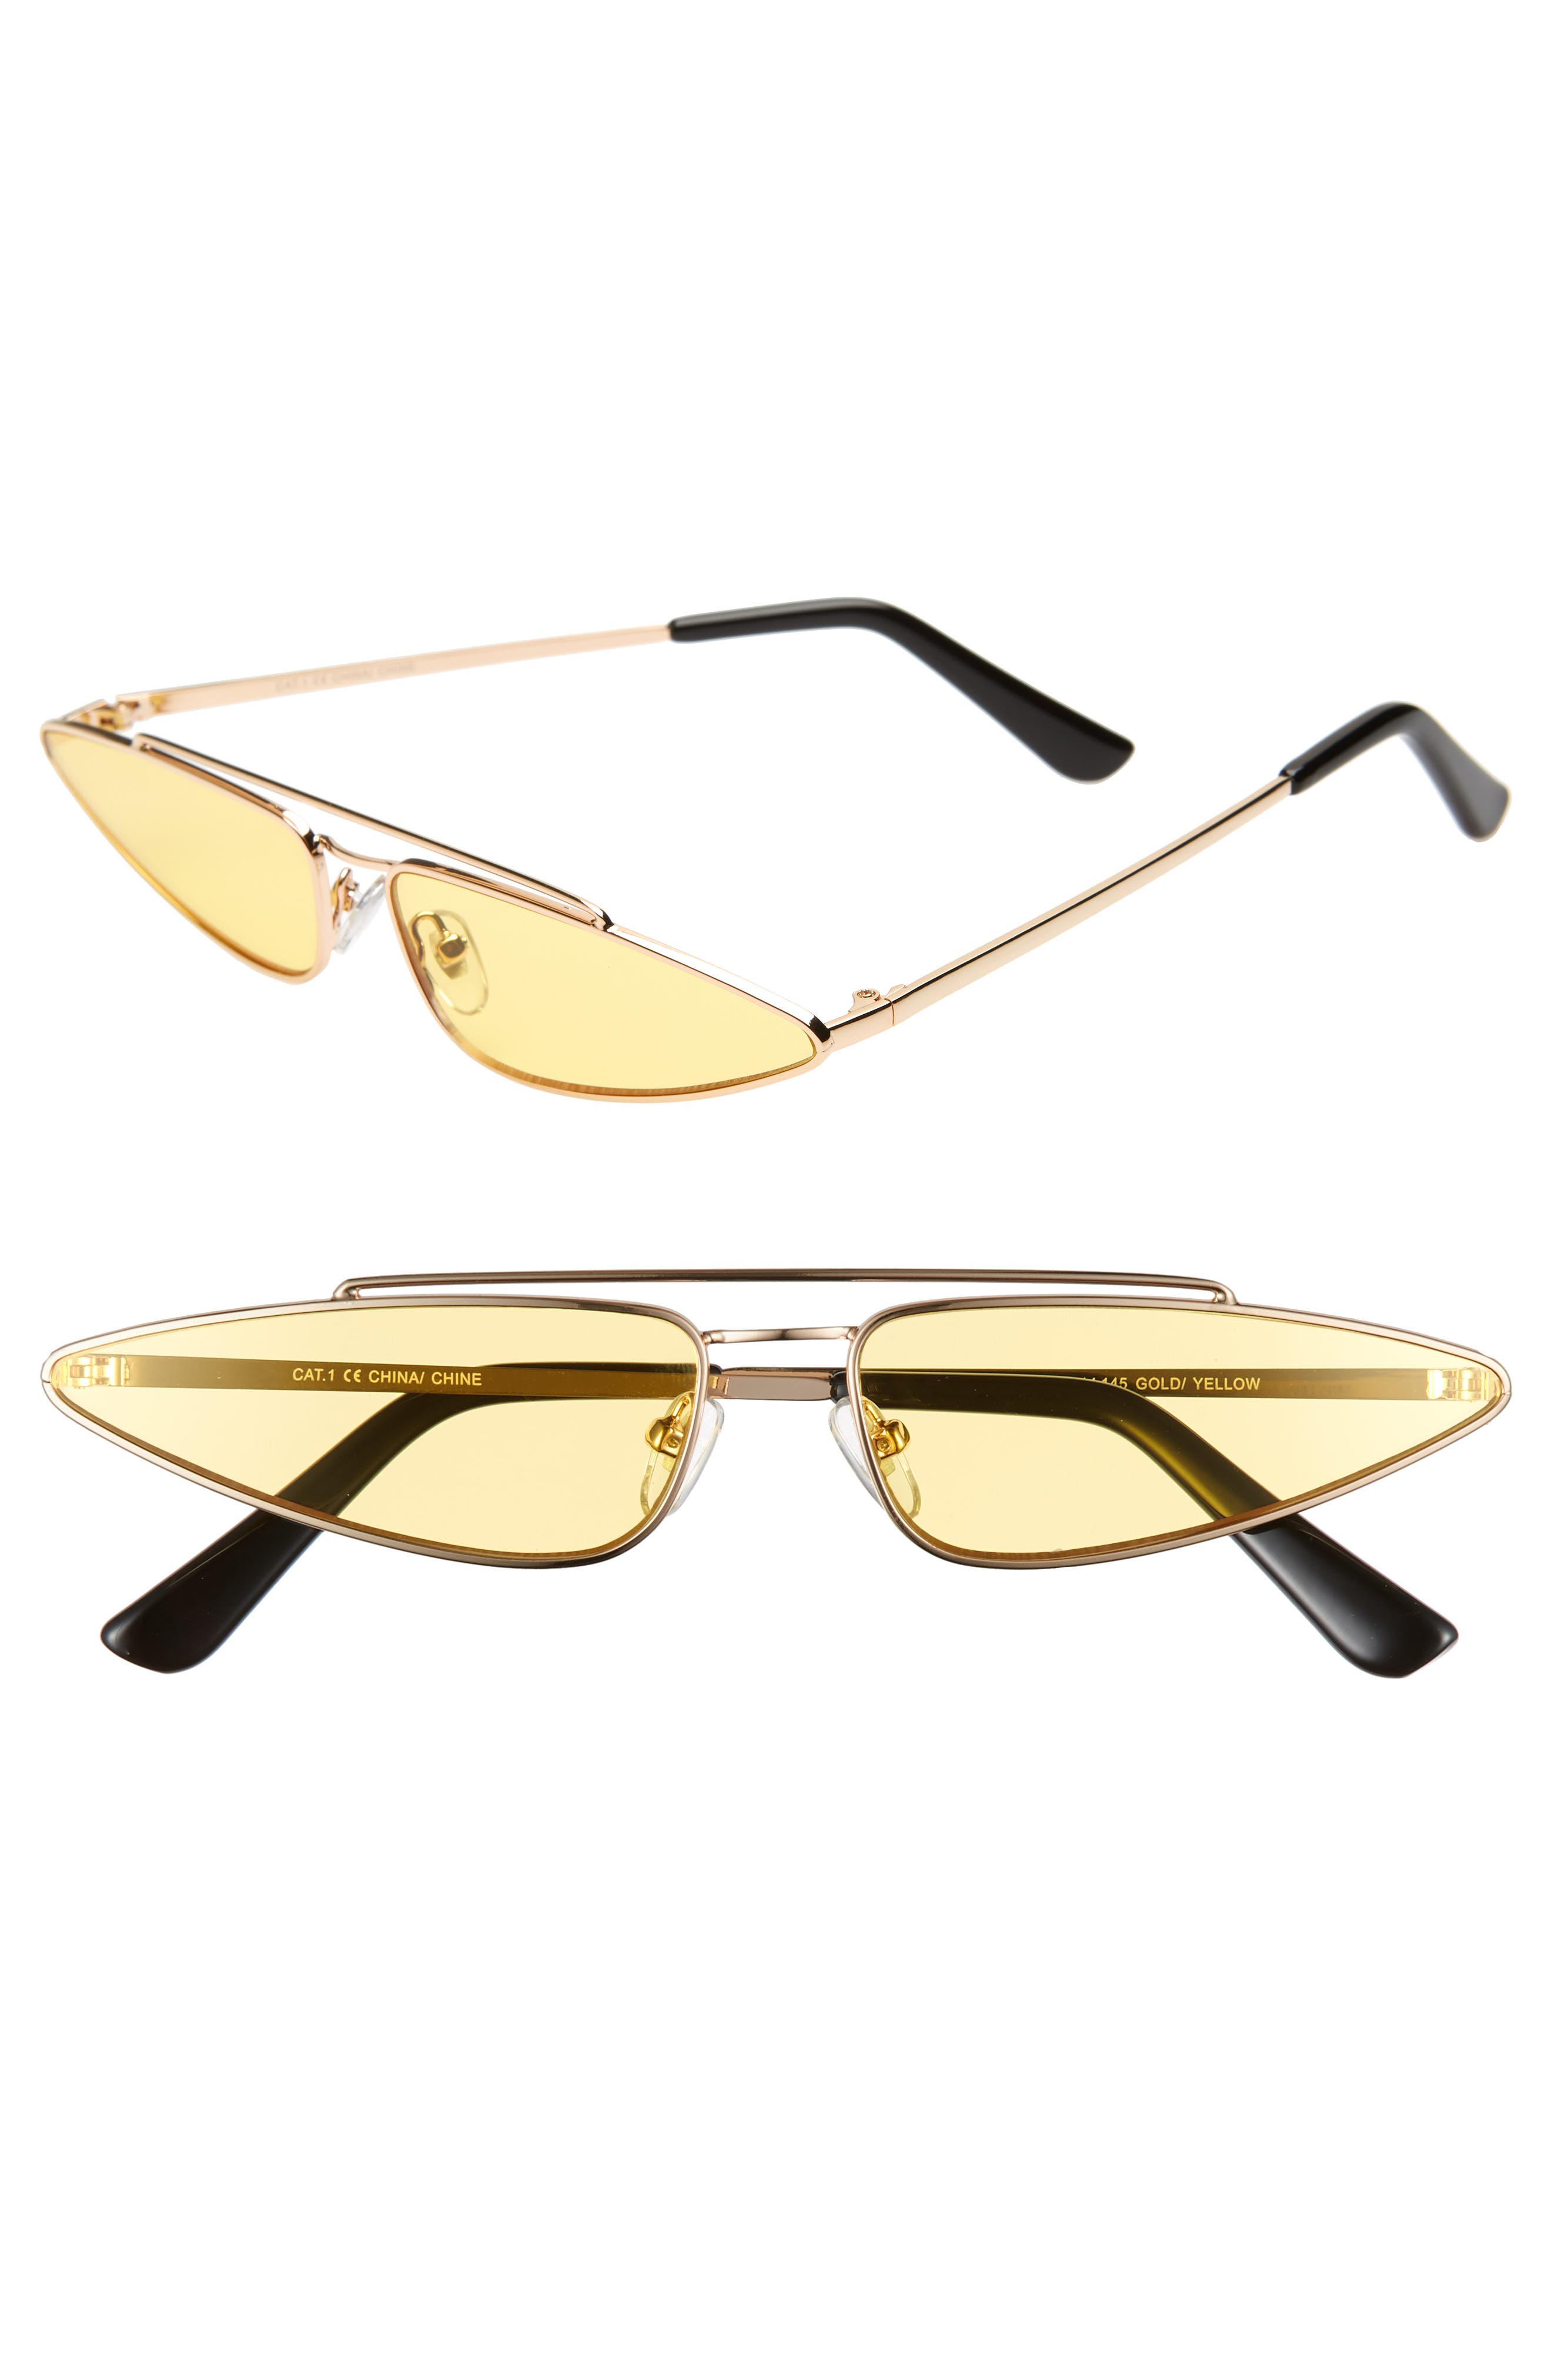 THE RAIL, Zane 45mm Sunglasses, Main thumbnail 1, color, GOLD/ YELLOW